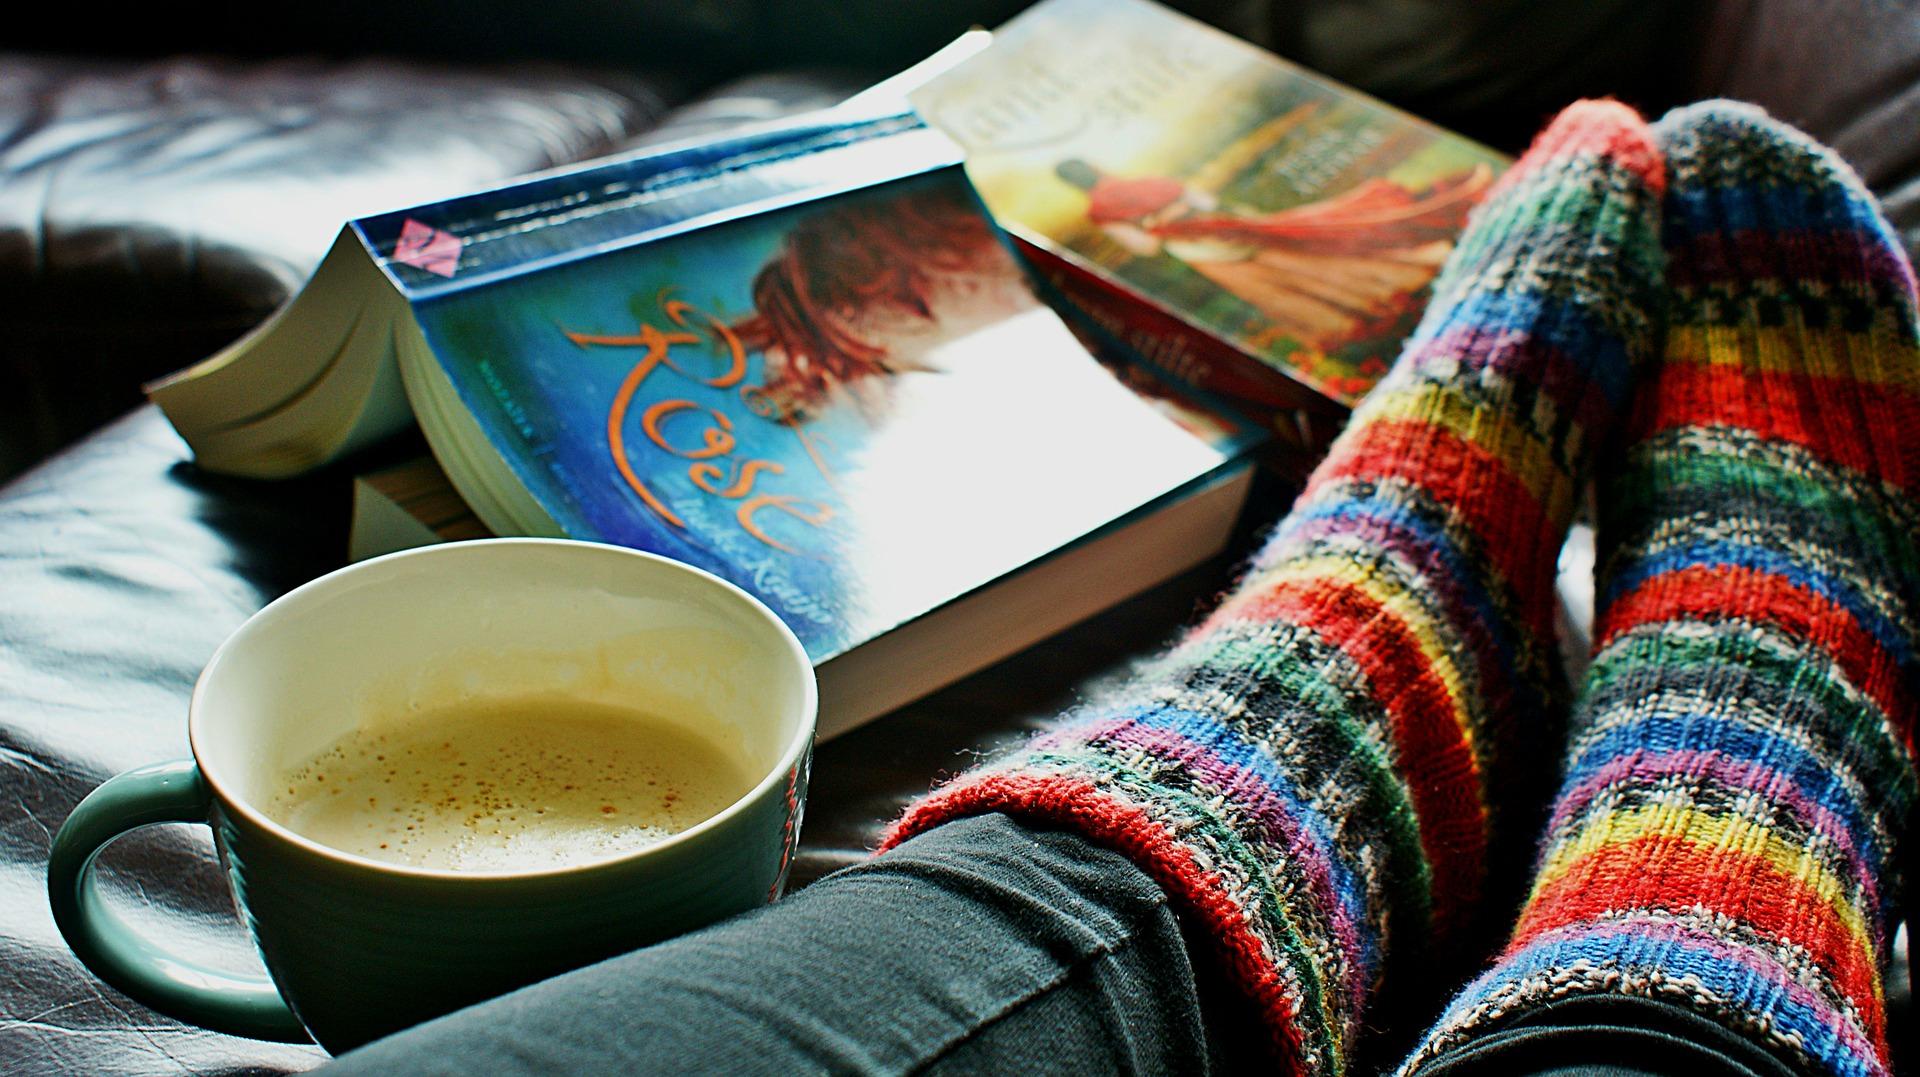 Warm socks hot coffee